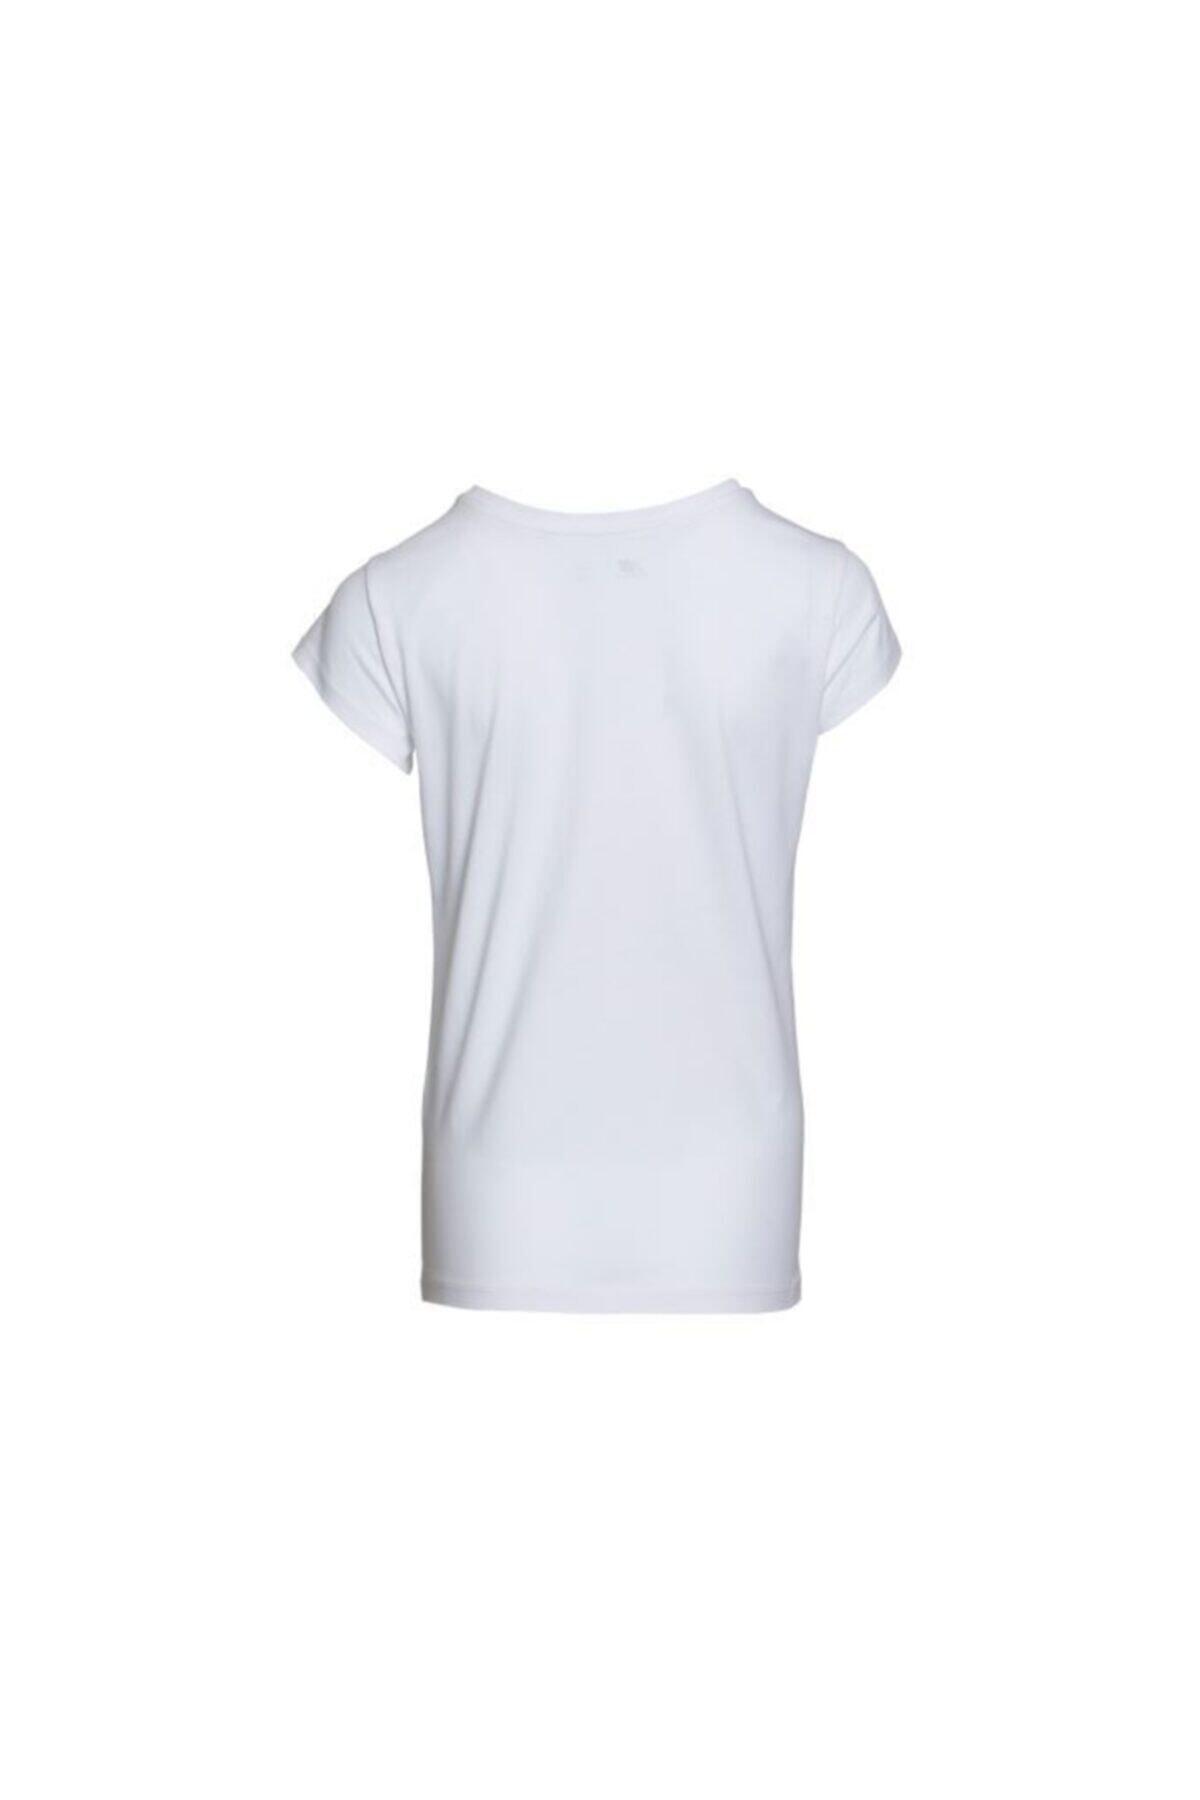 New Balance Kadın Beyaz T-shirt Wps001-wt 2